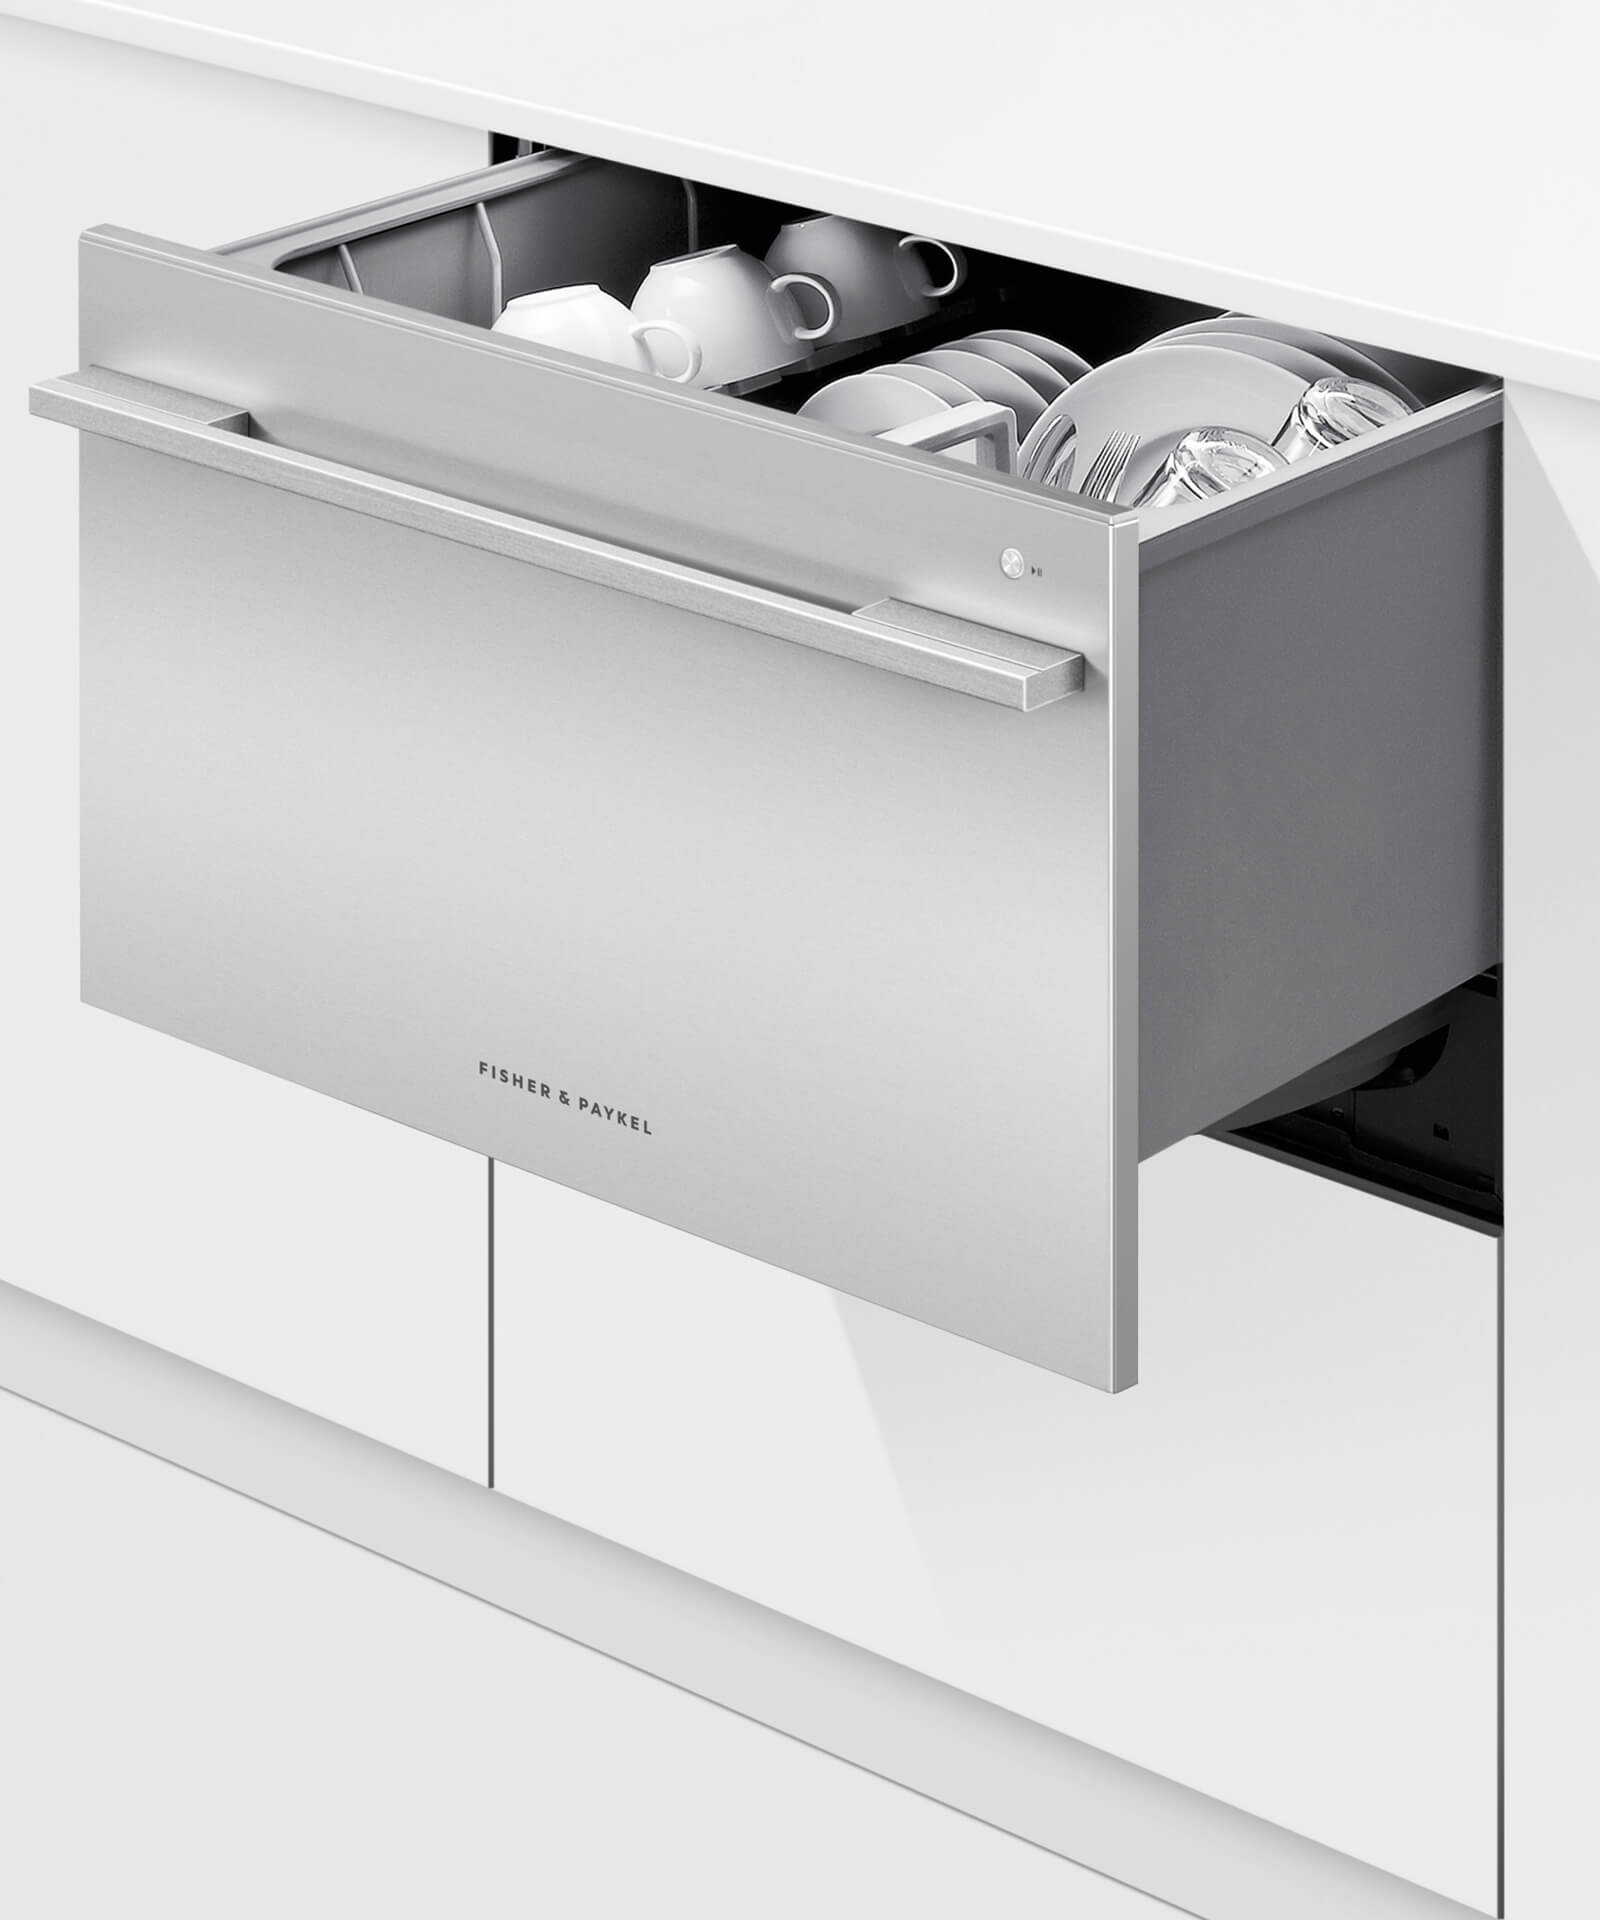 Dd60sdfhx9 Dishdrawer Dishwasher With 7 Place Settings